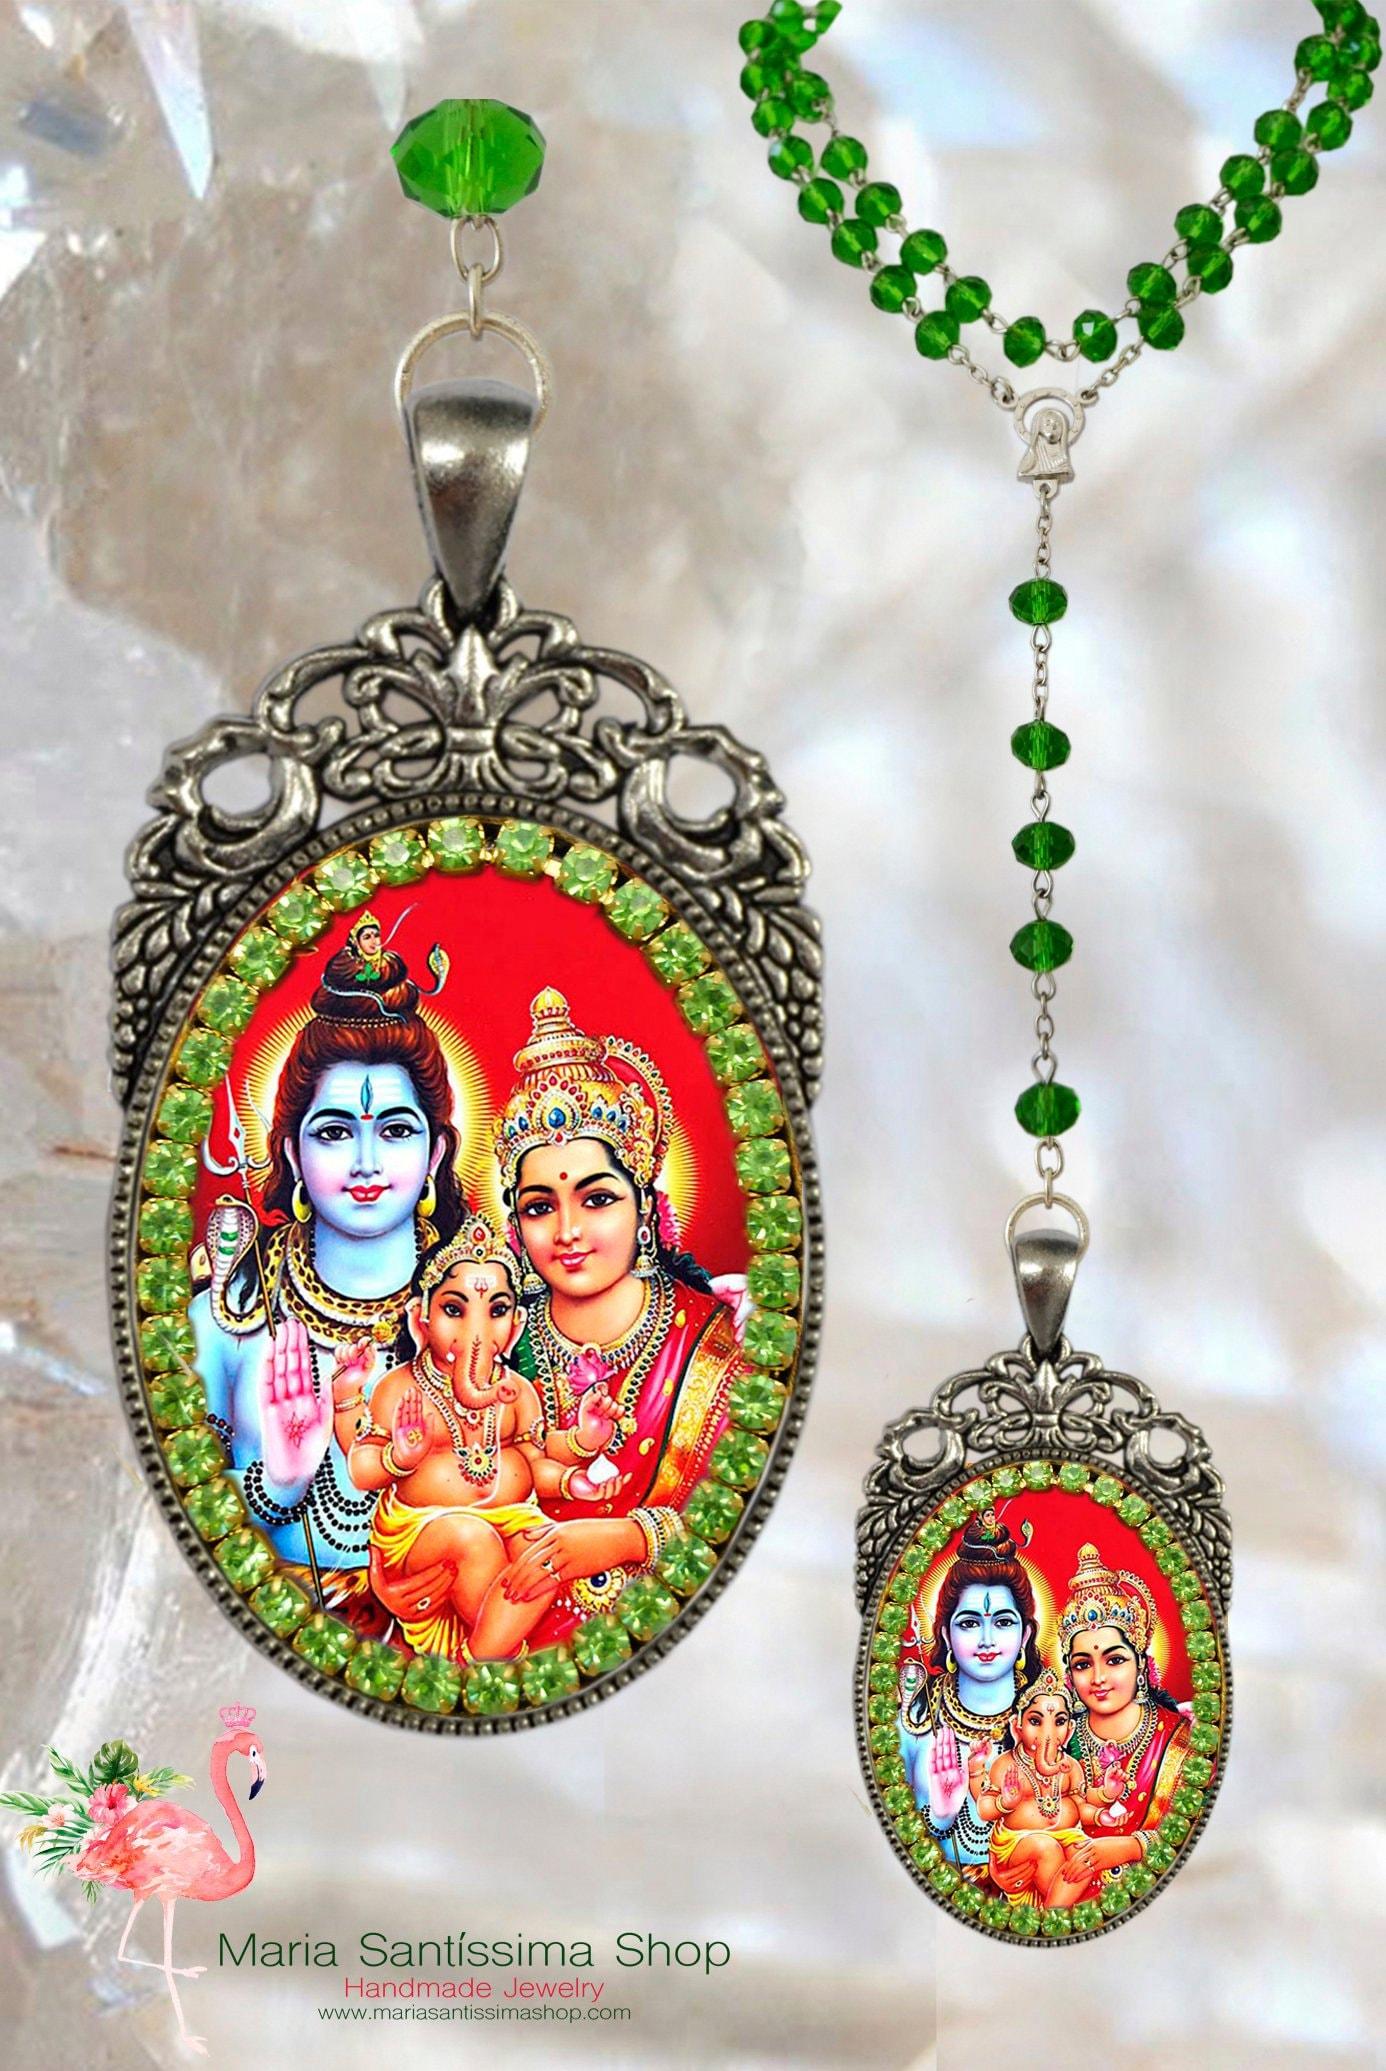 Vasudeva Tenderness and Love Necklace Hindu Jewelry Govinda Madhusudhana Mukunda Krishna Leela /& Mother Yasoda Rosary God of Compassion